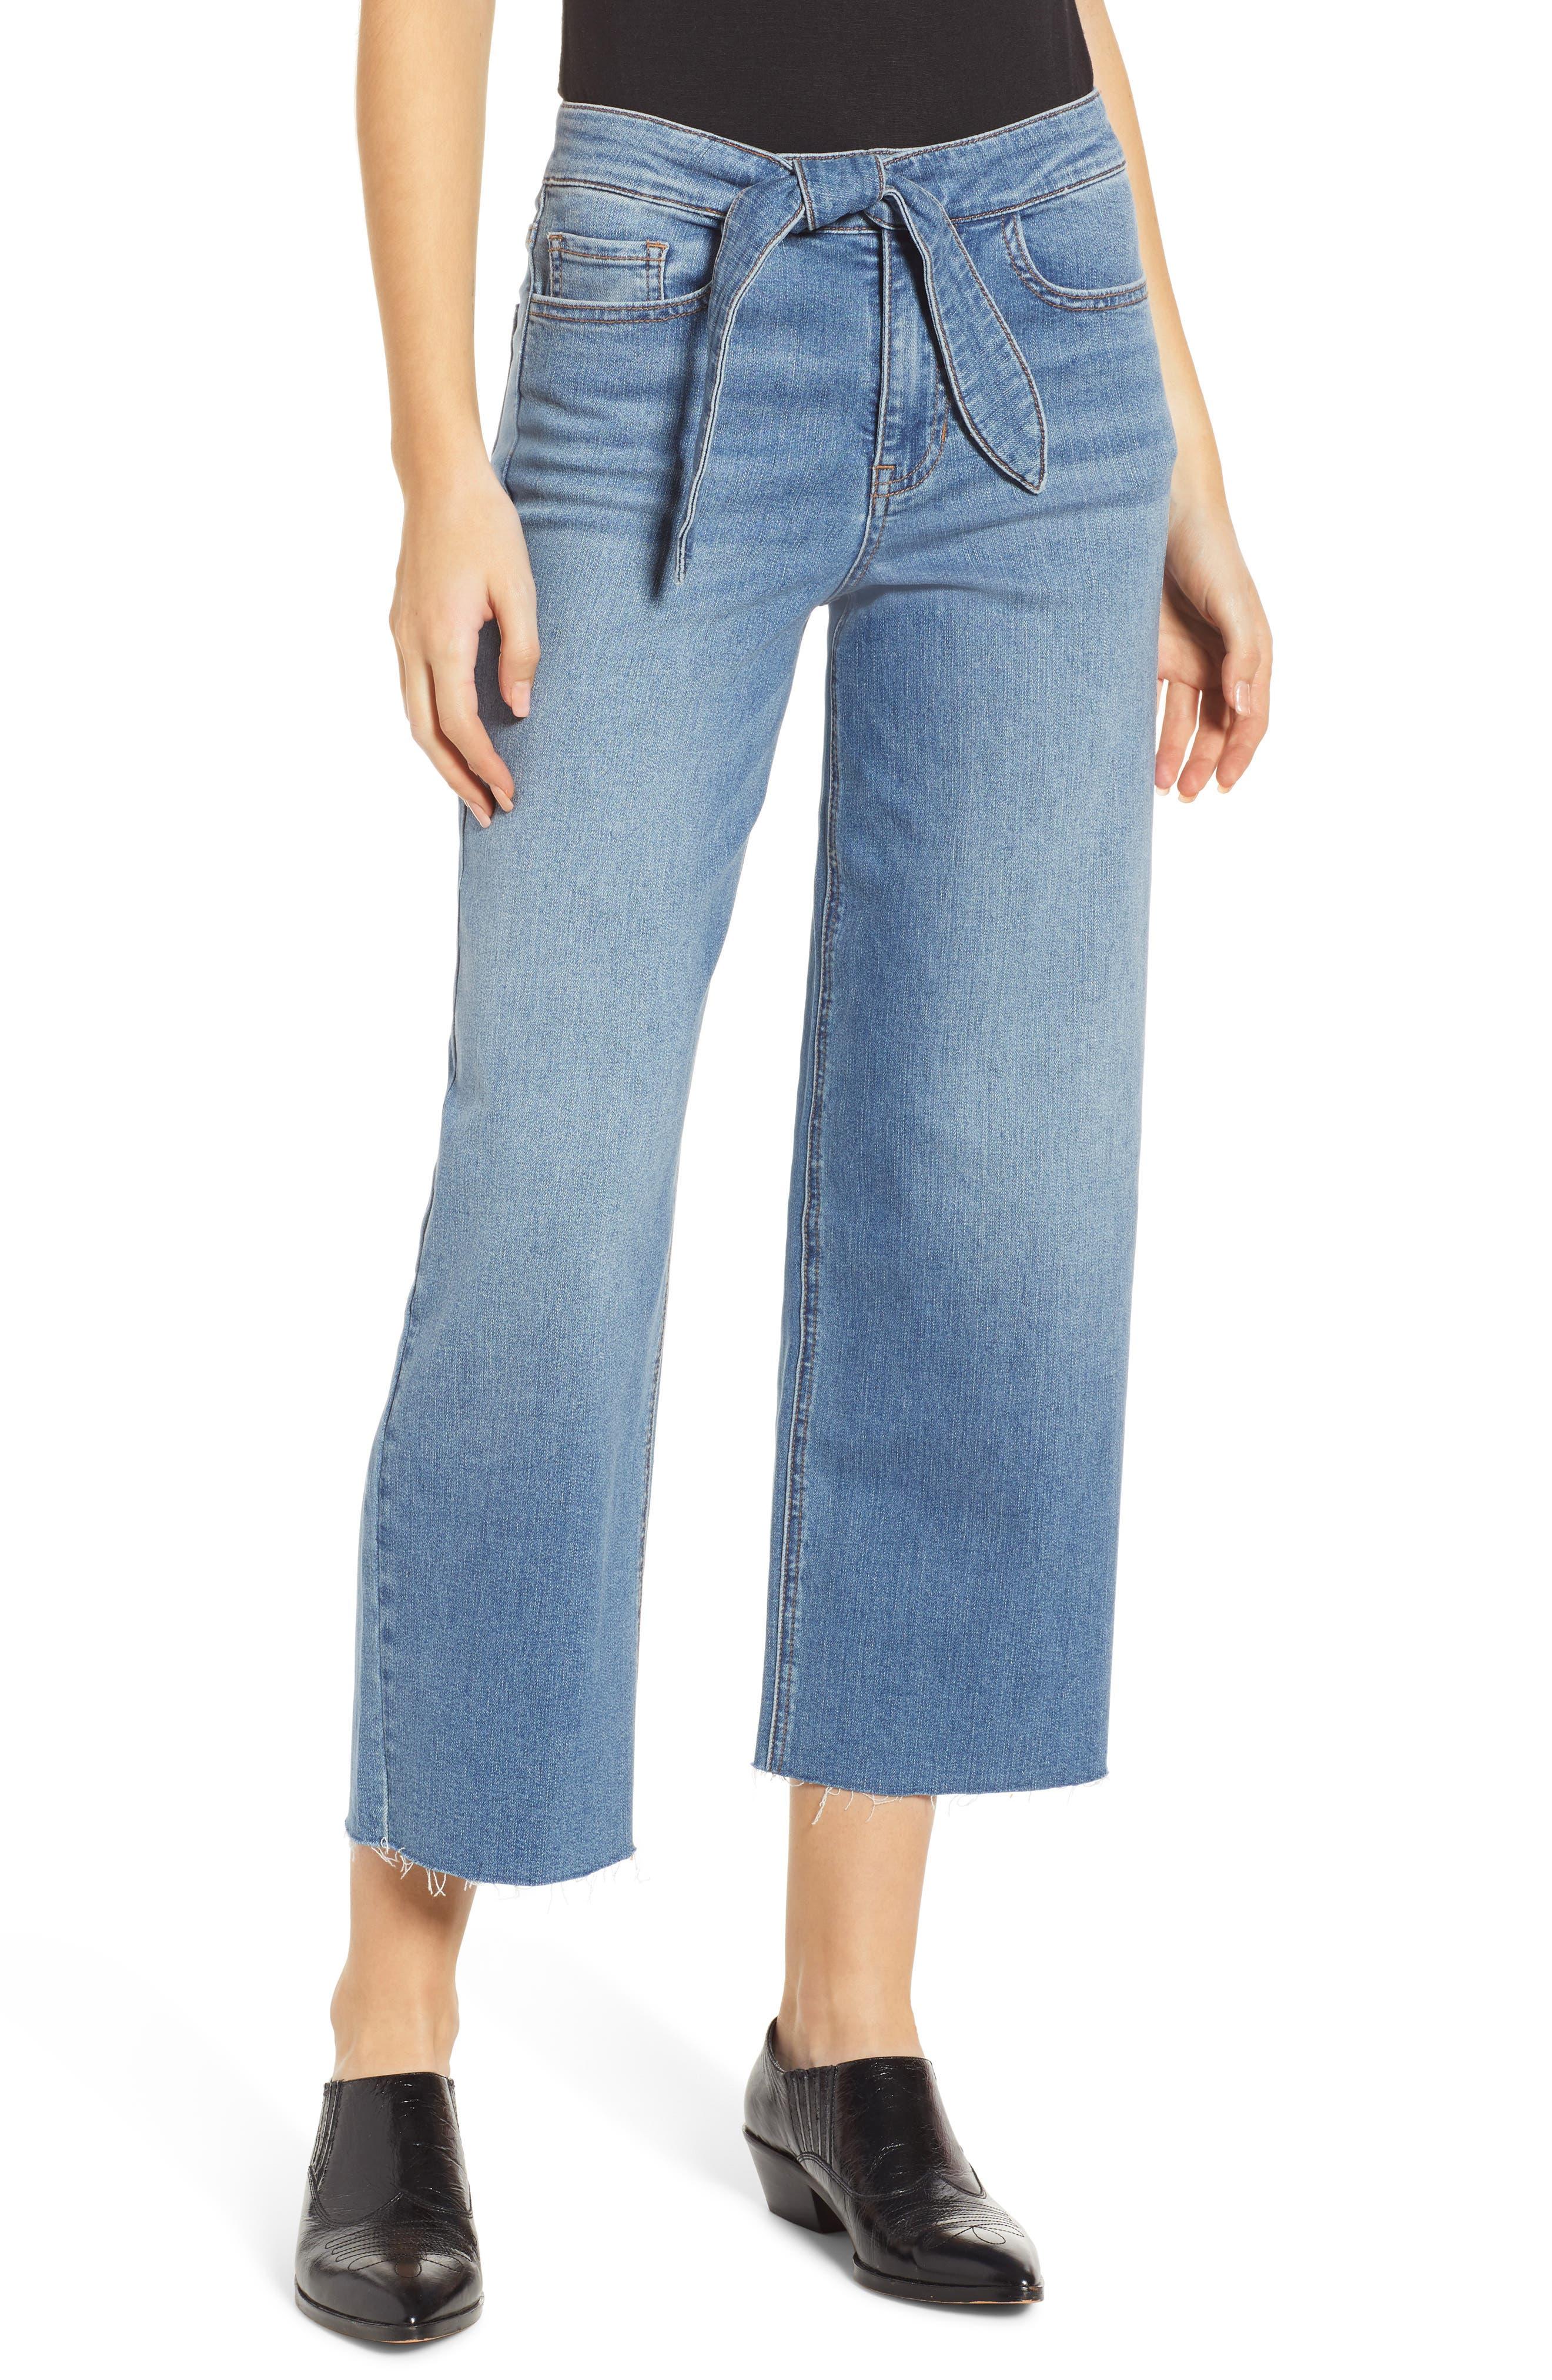 PROSPERITY DENIM, Belted Crop Wide Leg Jeans, Main thumbnail 1, color, PRETTY WASH